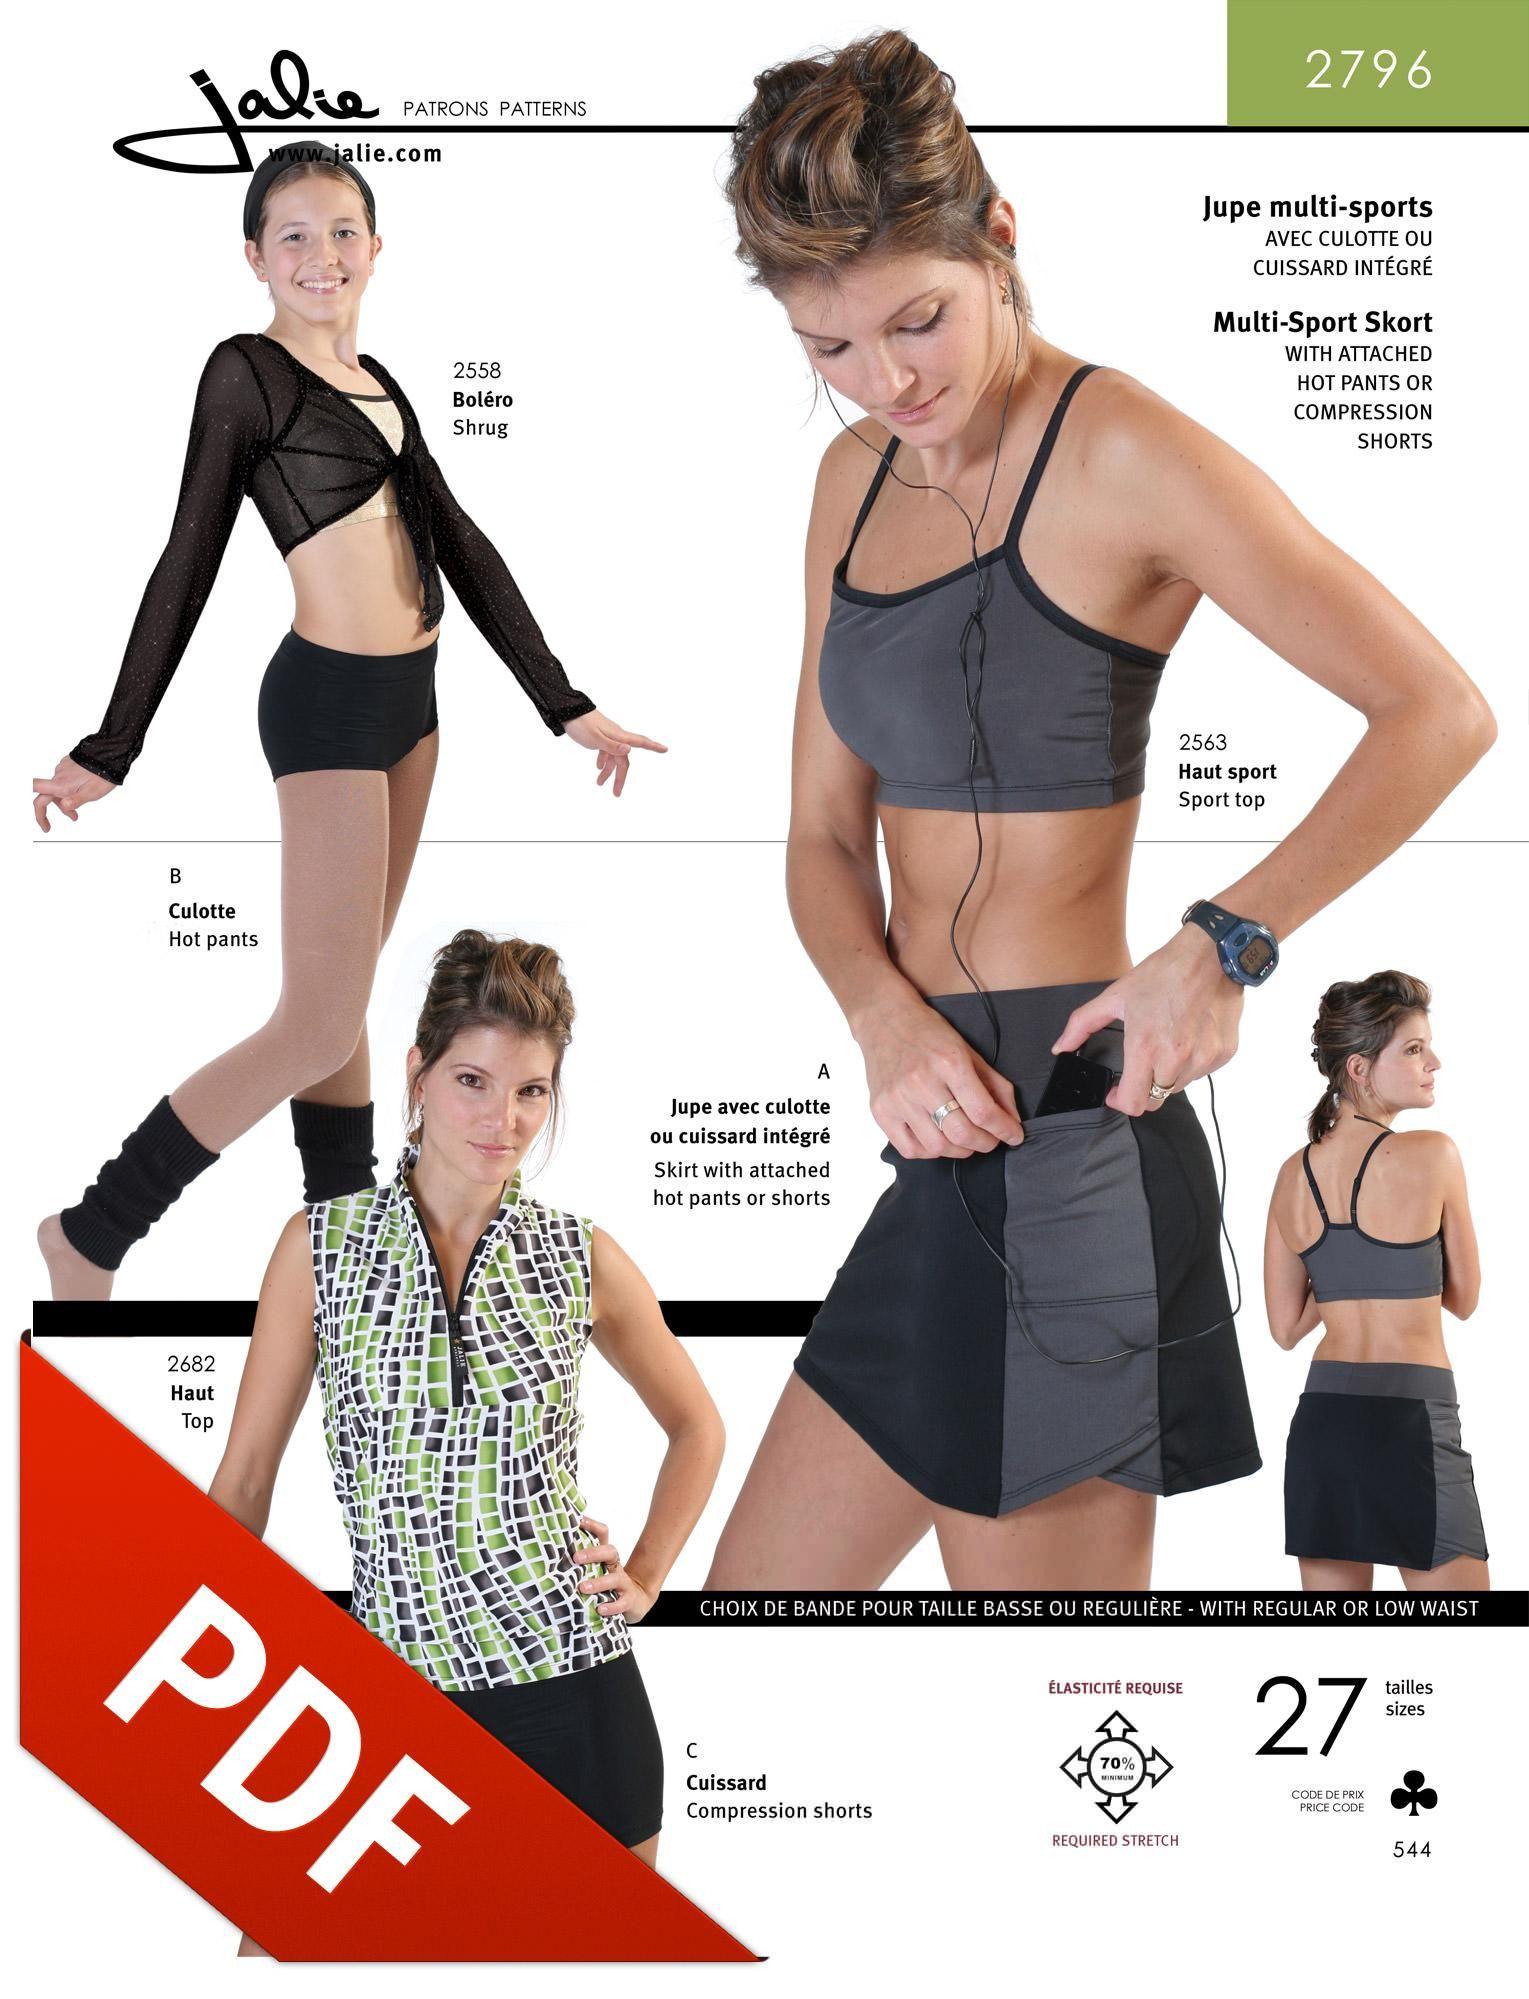 c2dd4c20e45b Multi-Sport Skort | patterns | Skirt patterns sewing, Sports skirts ...